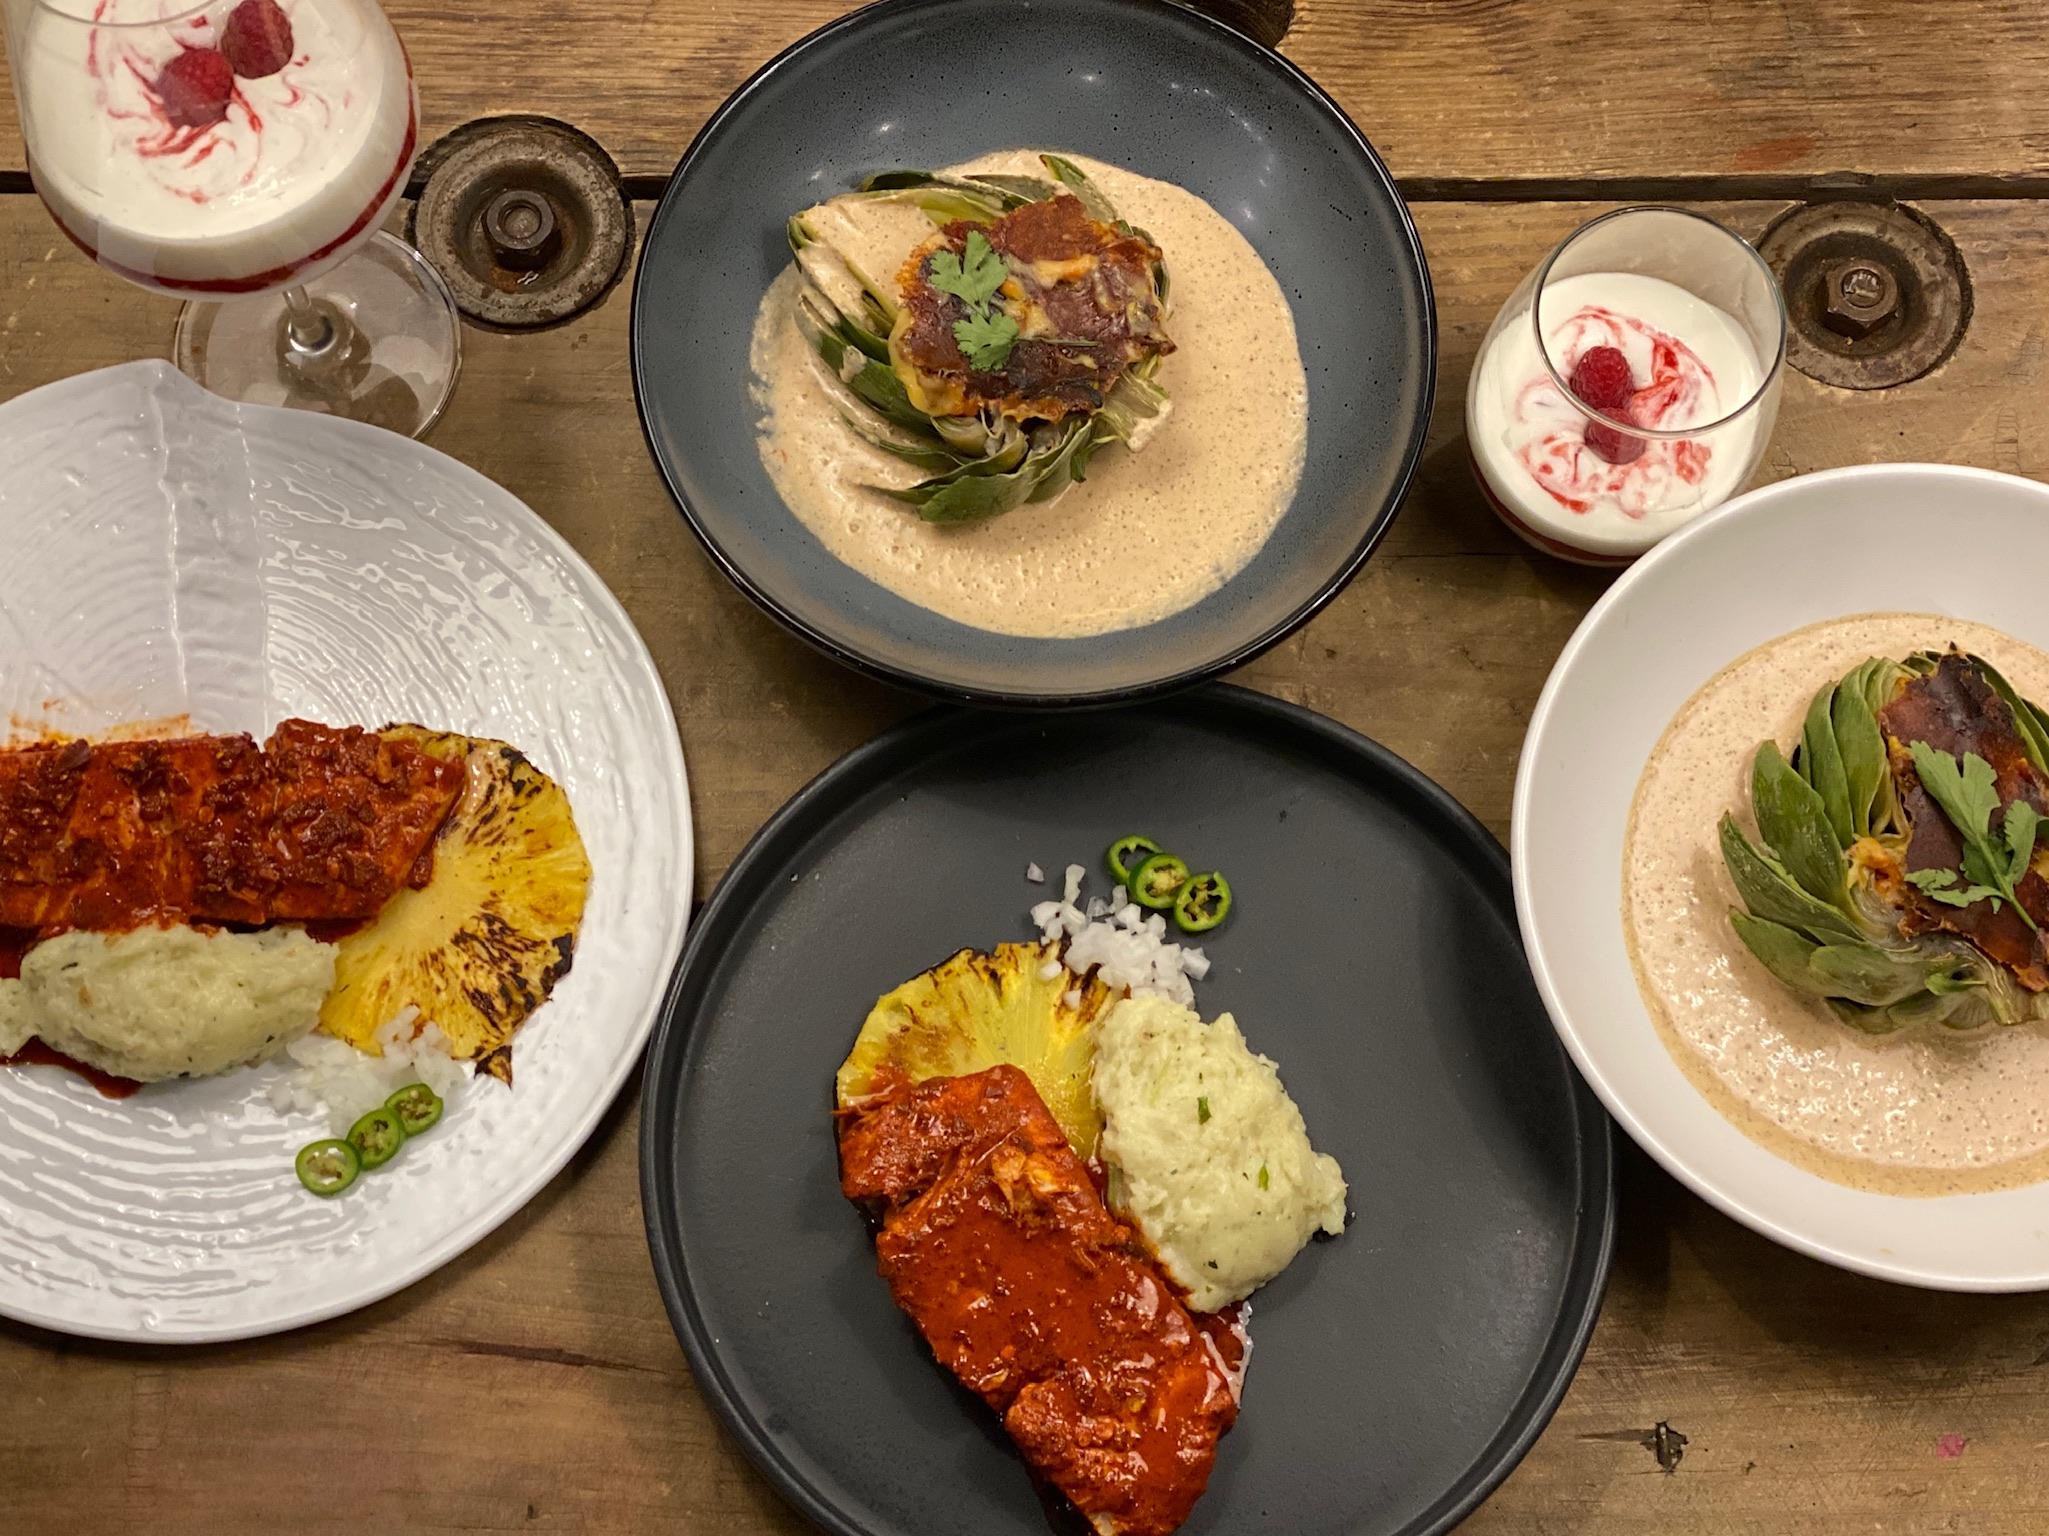 My Kitchen, Tu Casa: La chef Ana Martorell enseña a preparar platillos mexicanos desde casa